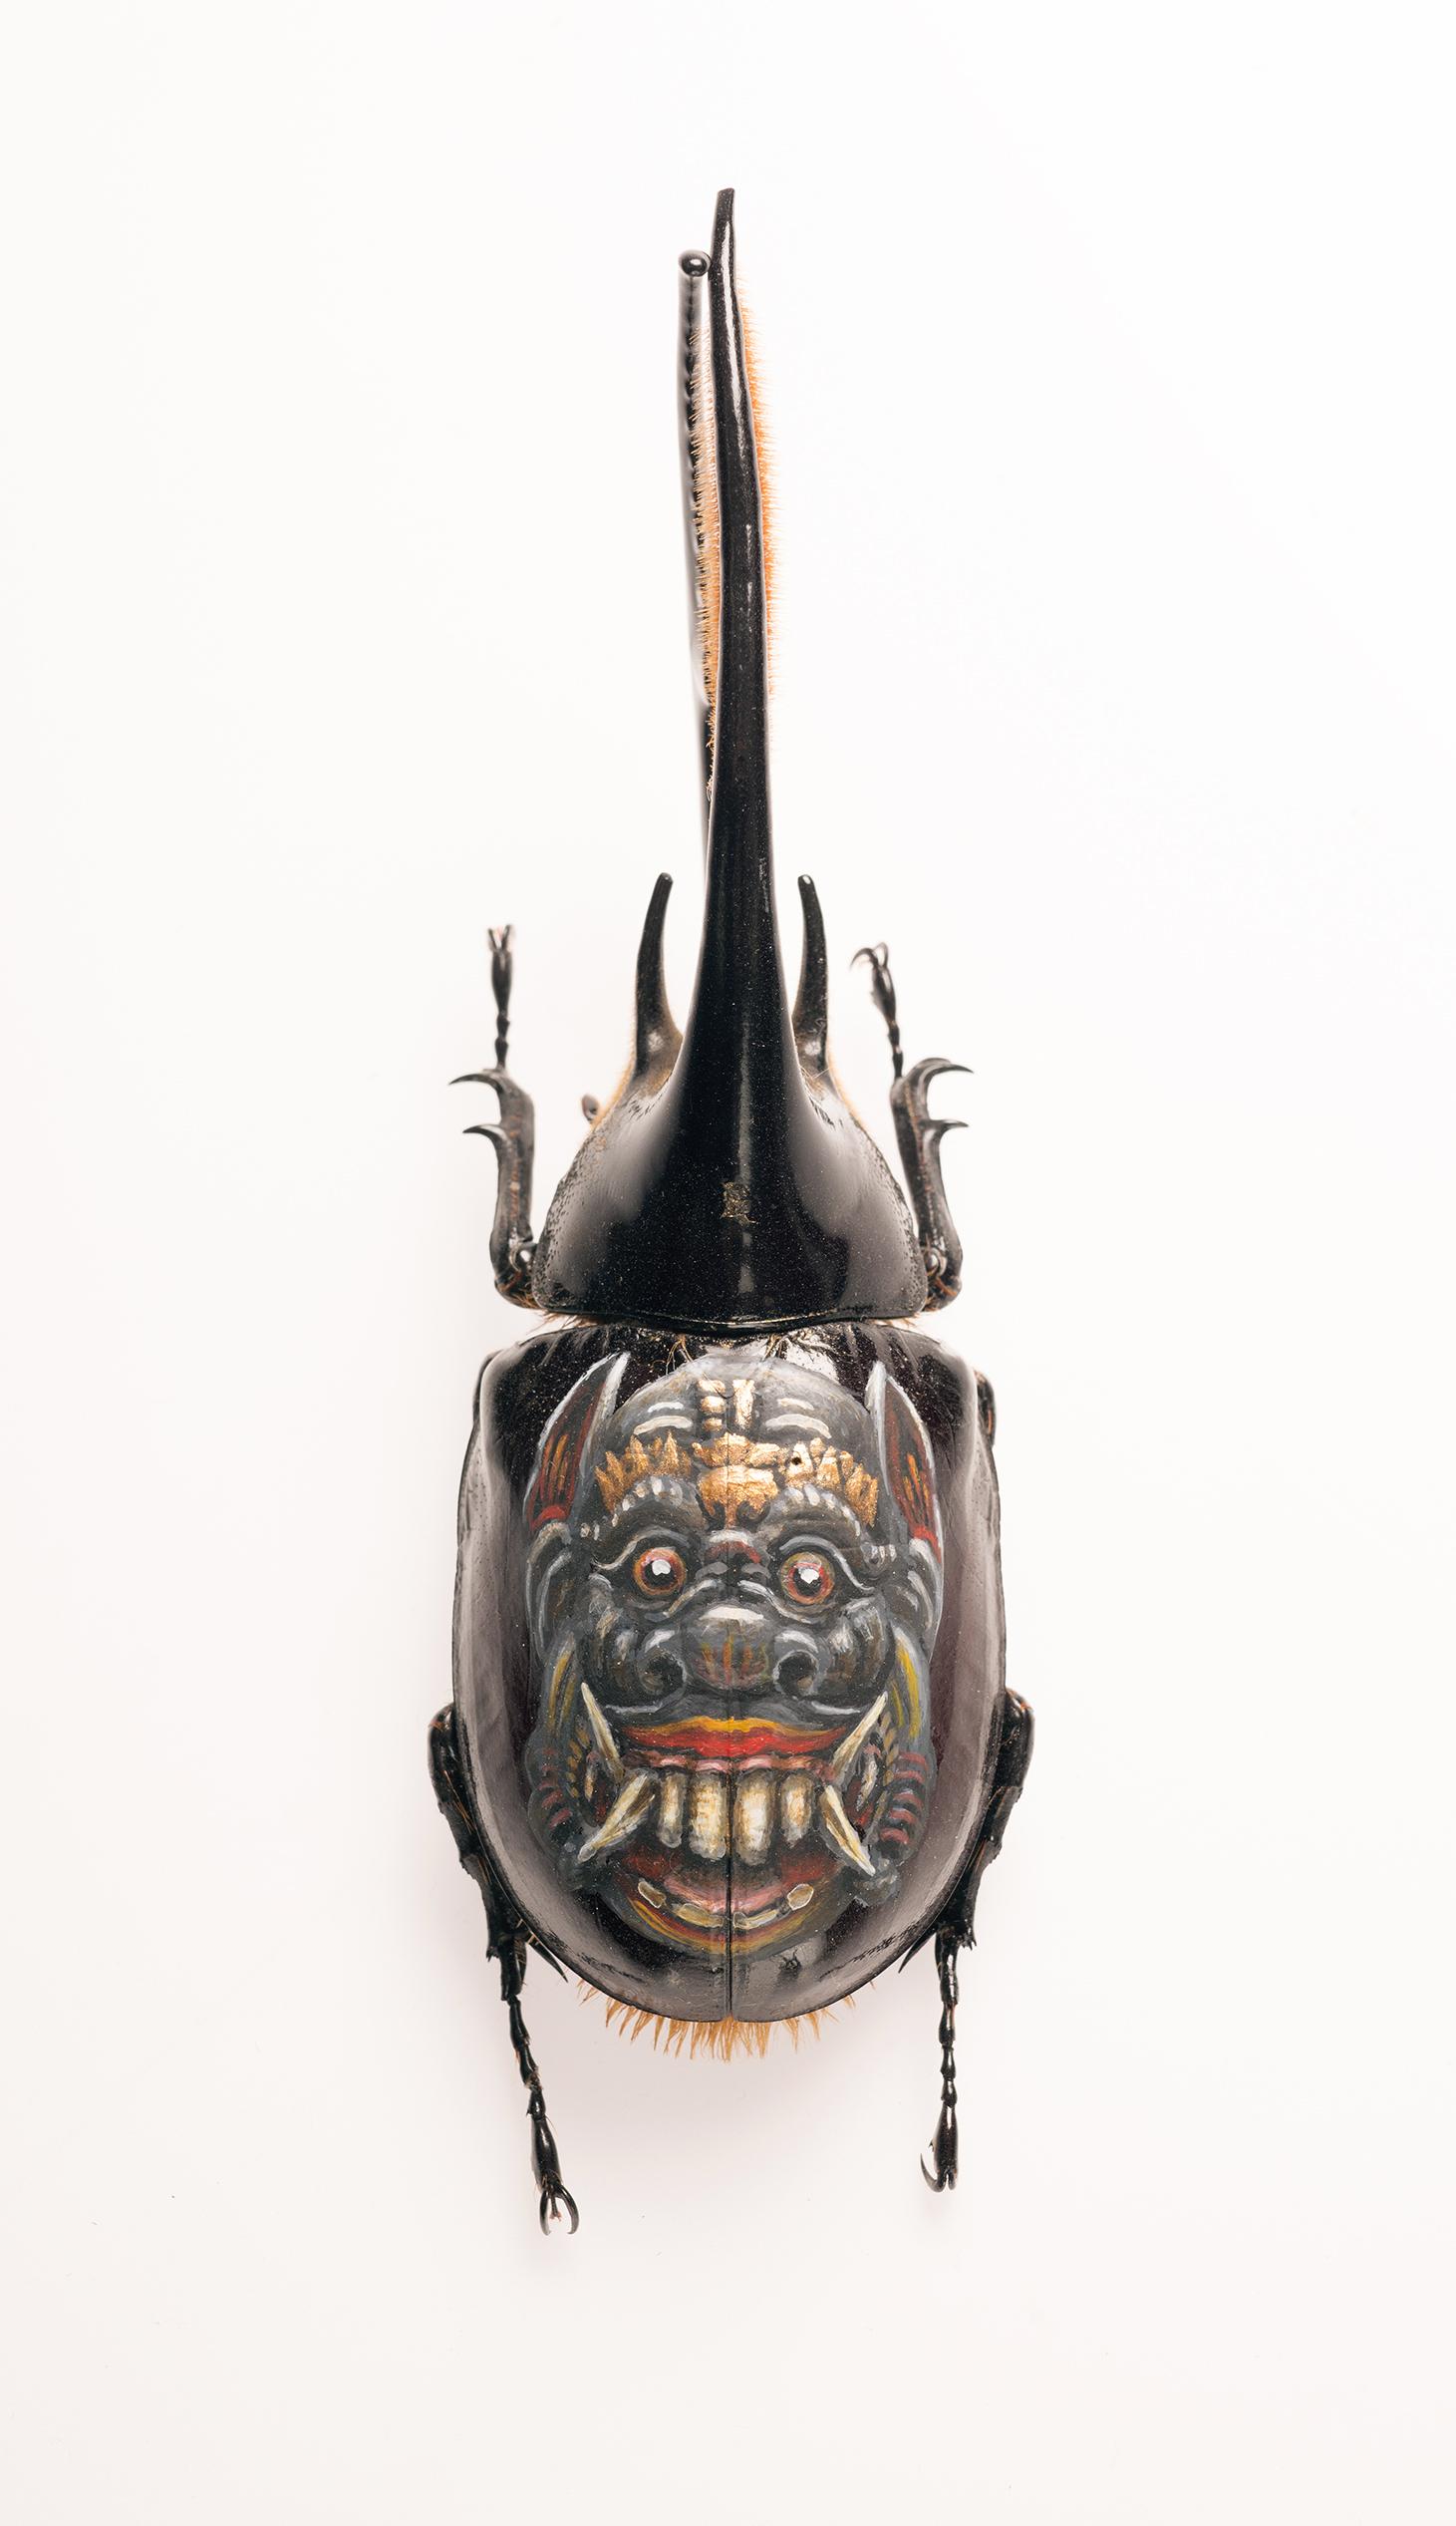 Evan Skrederstu.  Bali Mask.  2014 – acrylic on beetle, 4″ x 1.5″.